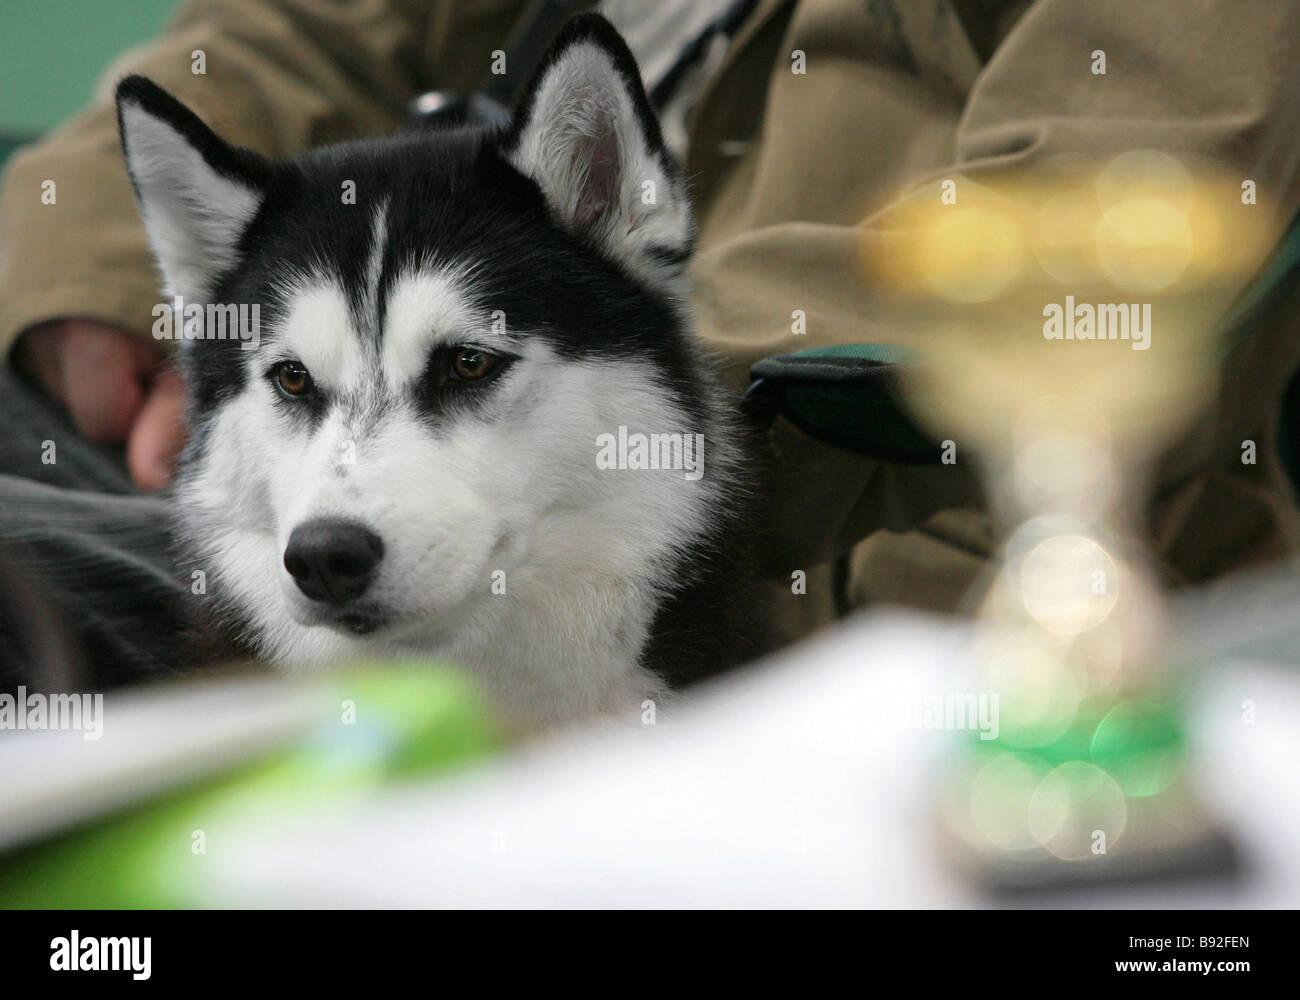 Siberian Husky Dog Dog Show Stock Photos & Siberian Husky Dog Dog ...